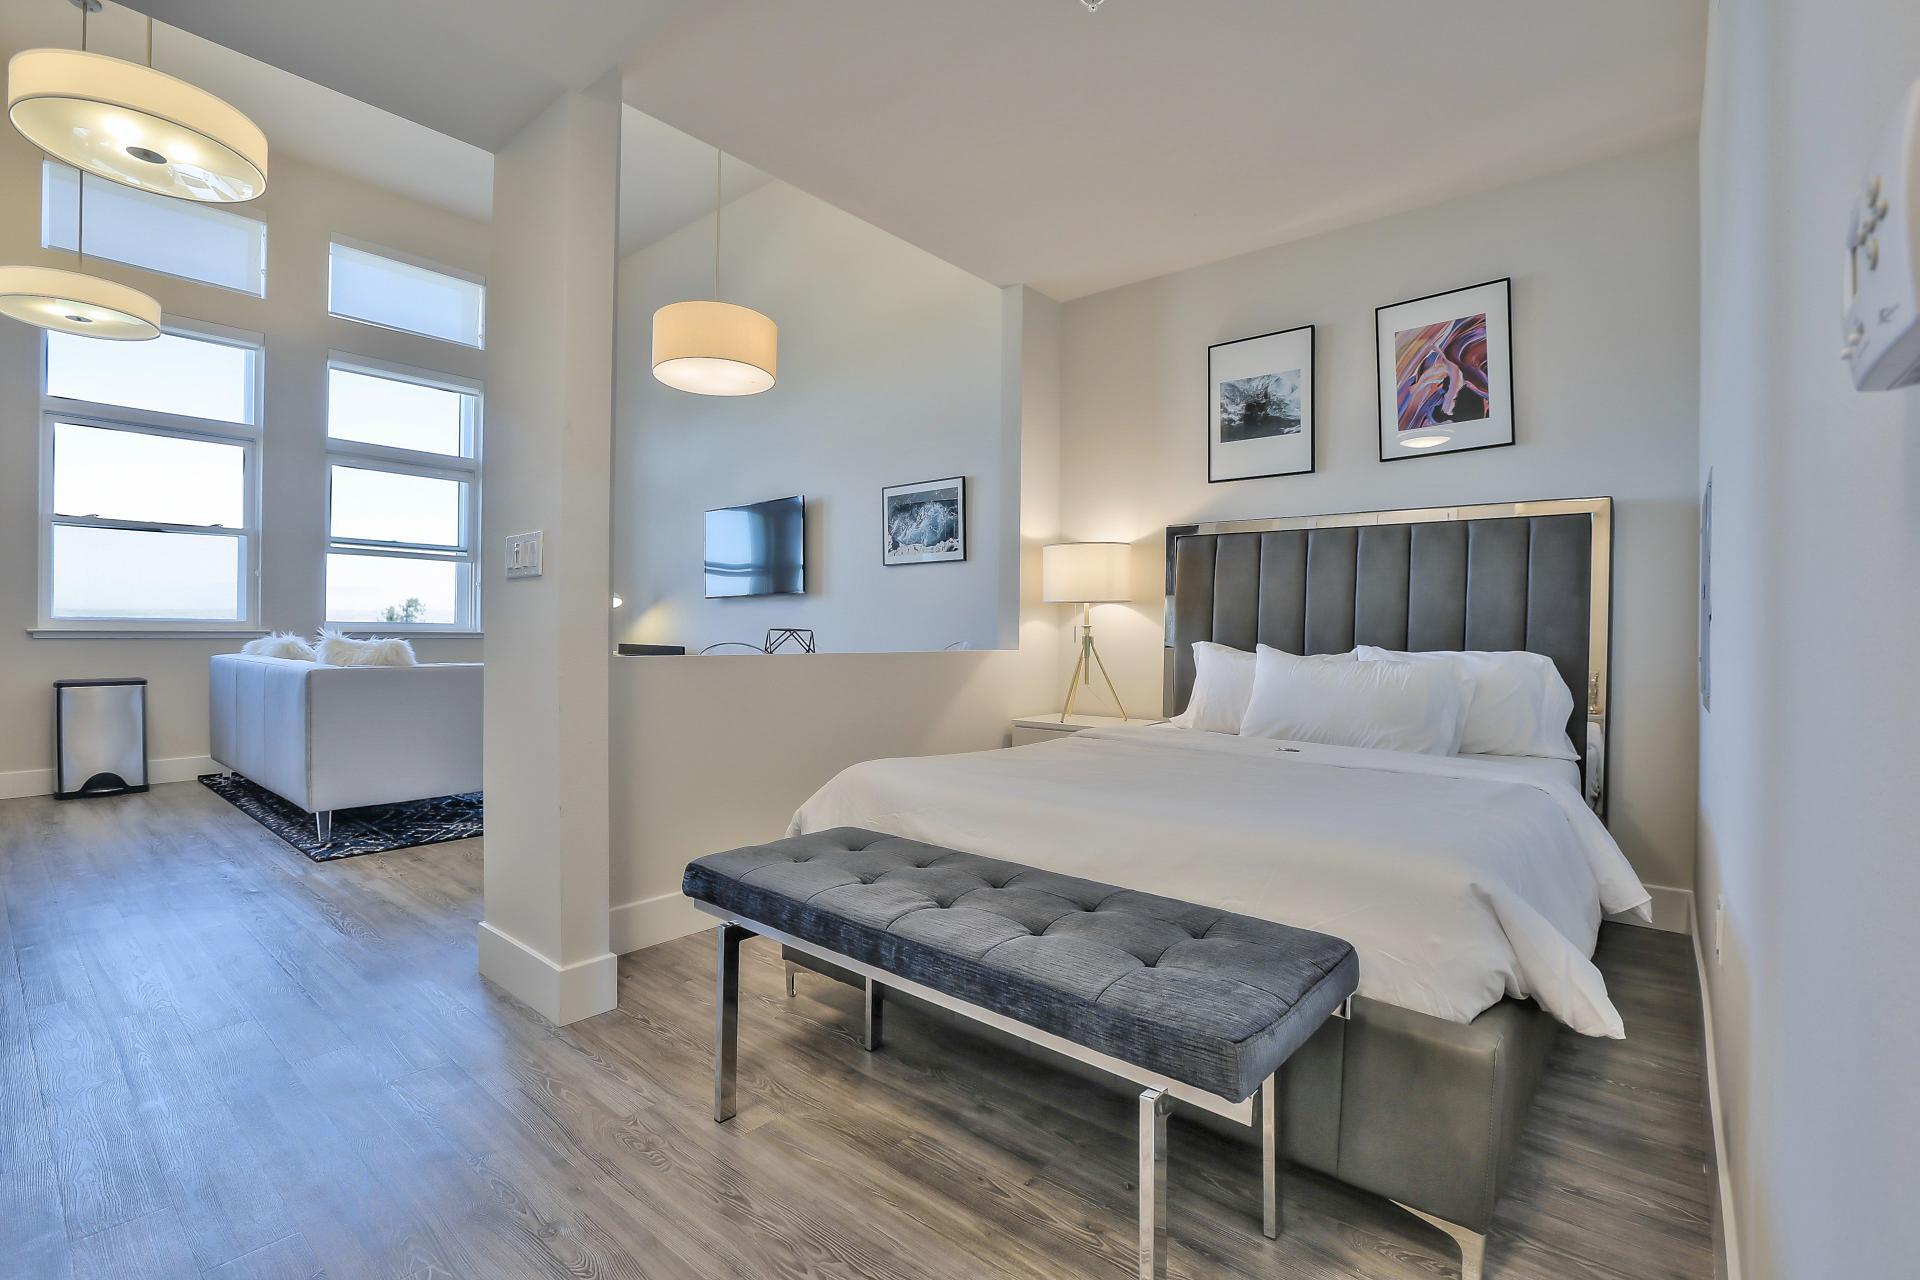 Bedroom at Franklin 299 Apartments